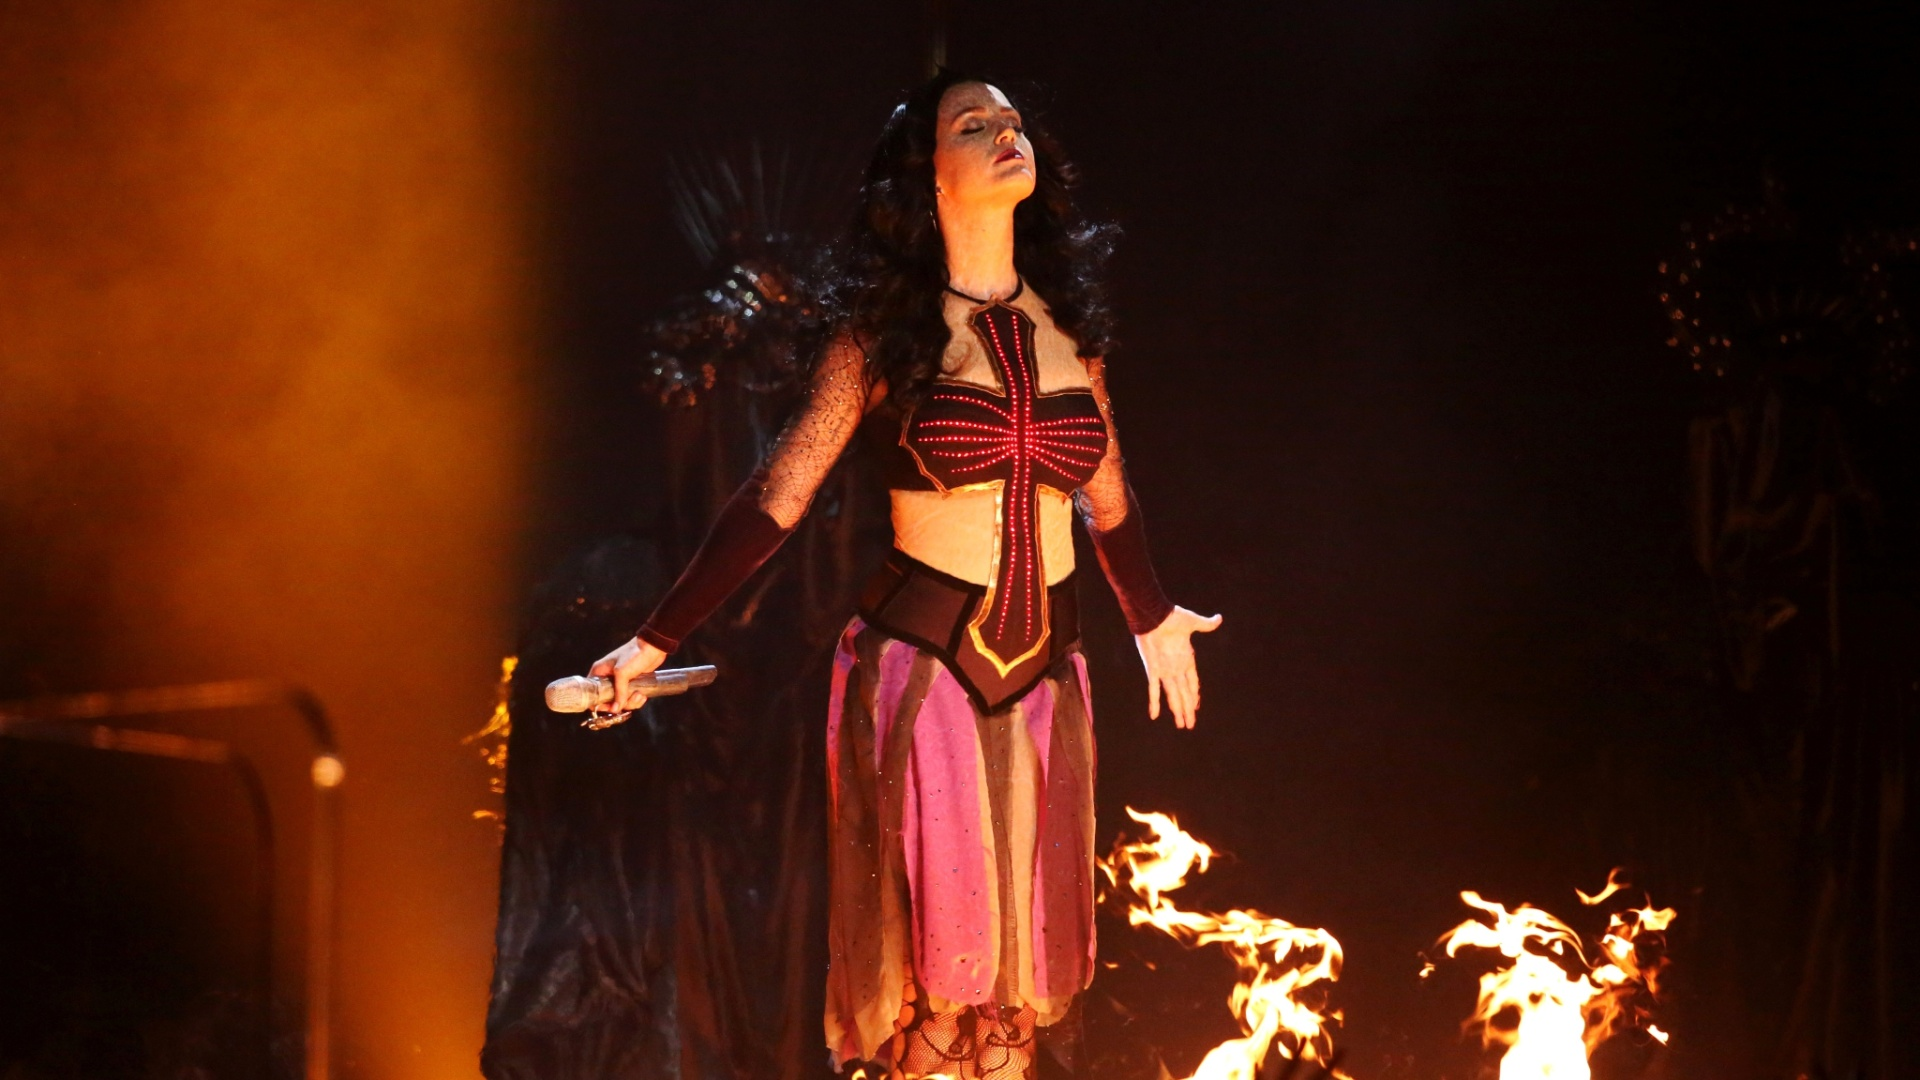 26.jan.2014 - Katy Perry apresentou seu single